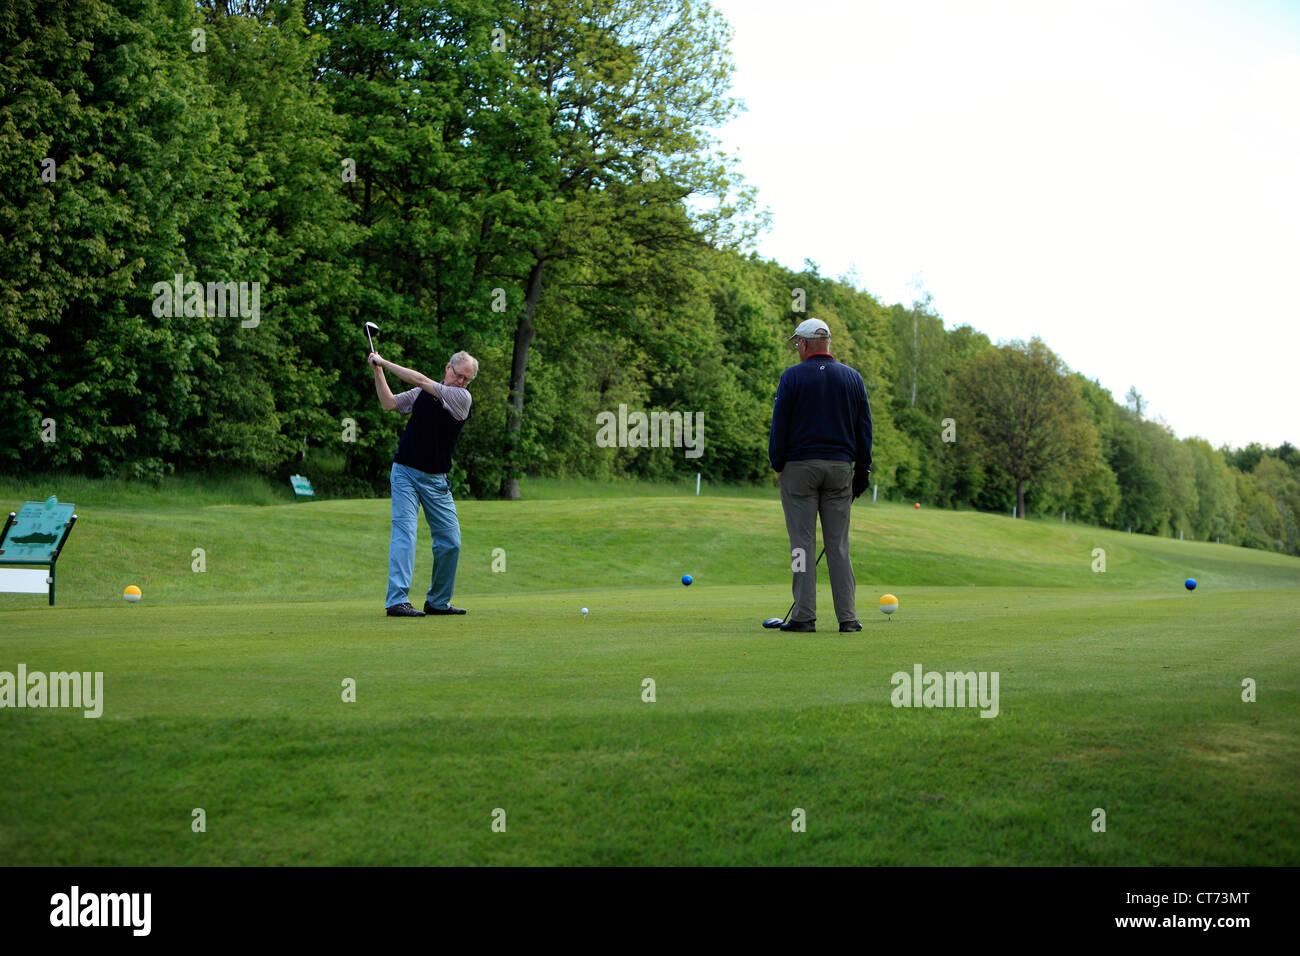 D-Dortmund, Ruhr area, Westphalia, North Rhine-Westphalia, NRW, Dortmunder Golfclub, golf course in the Reichsmark, Stock Photo